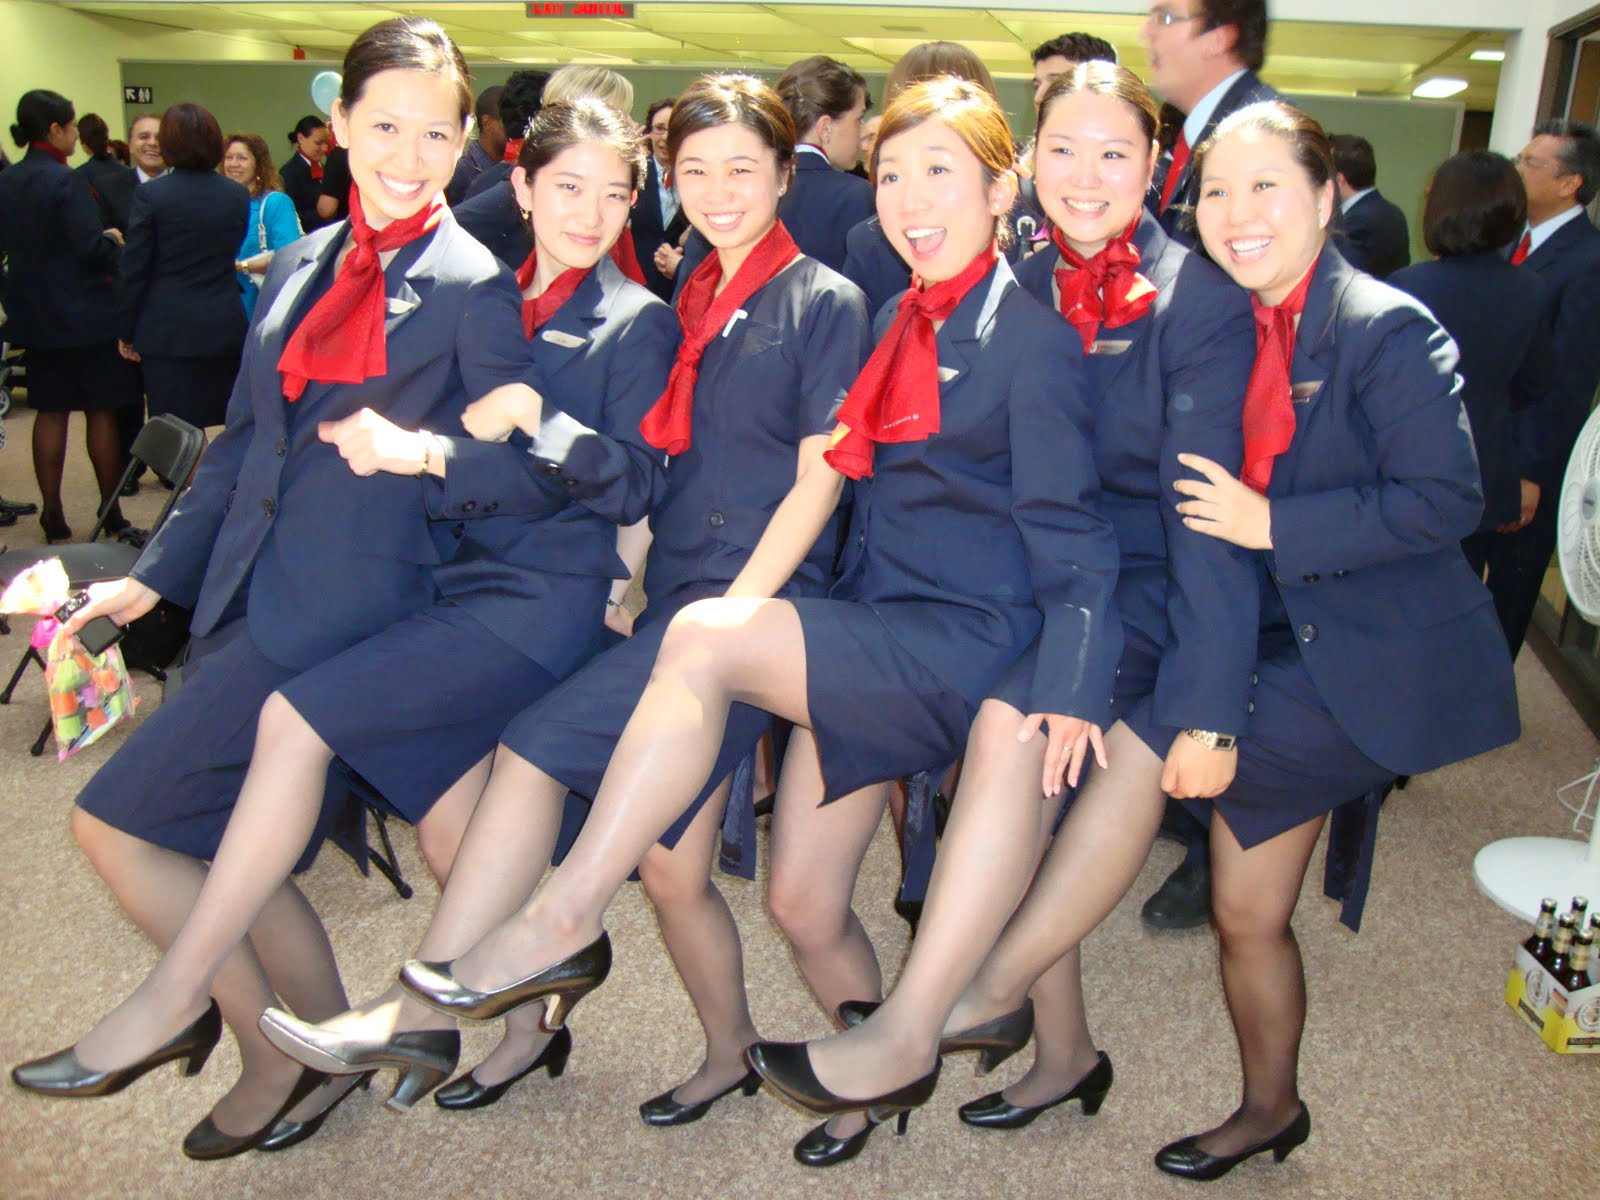 Stewardess in training mode